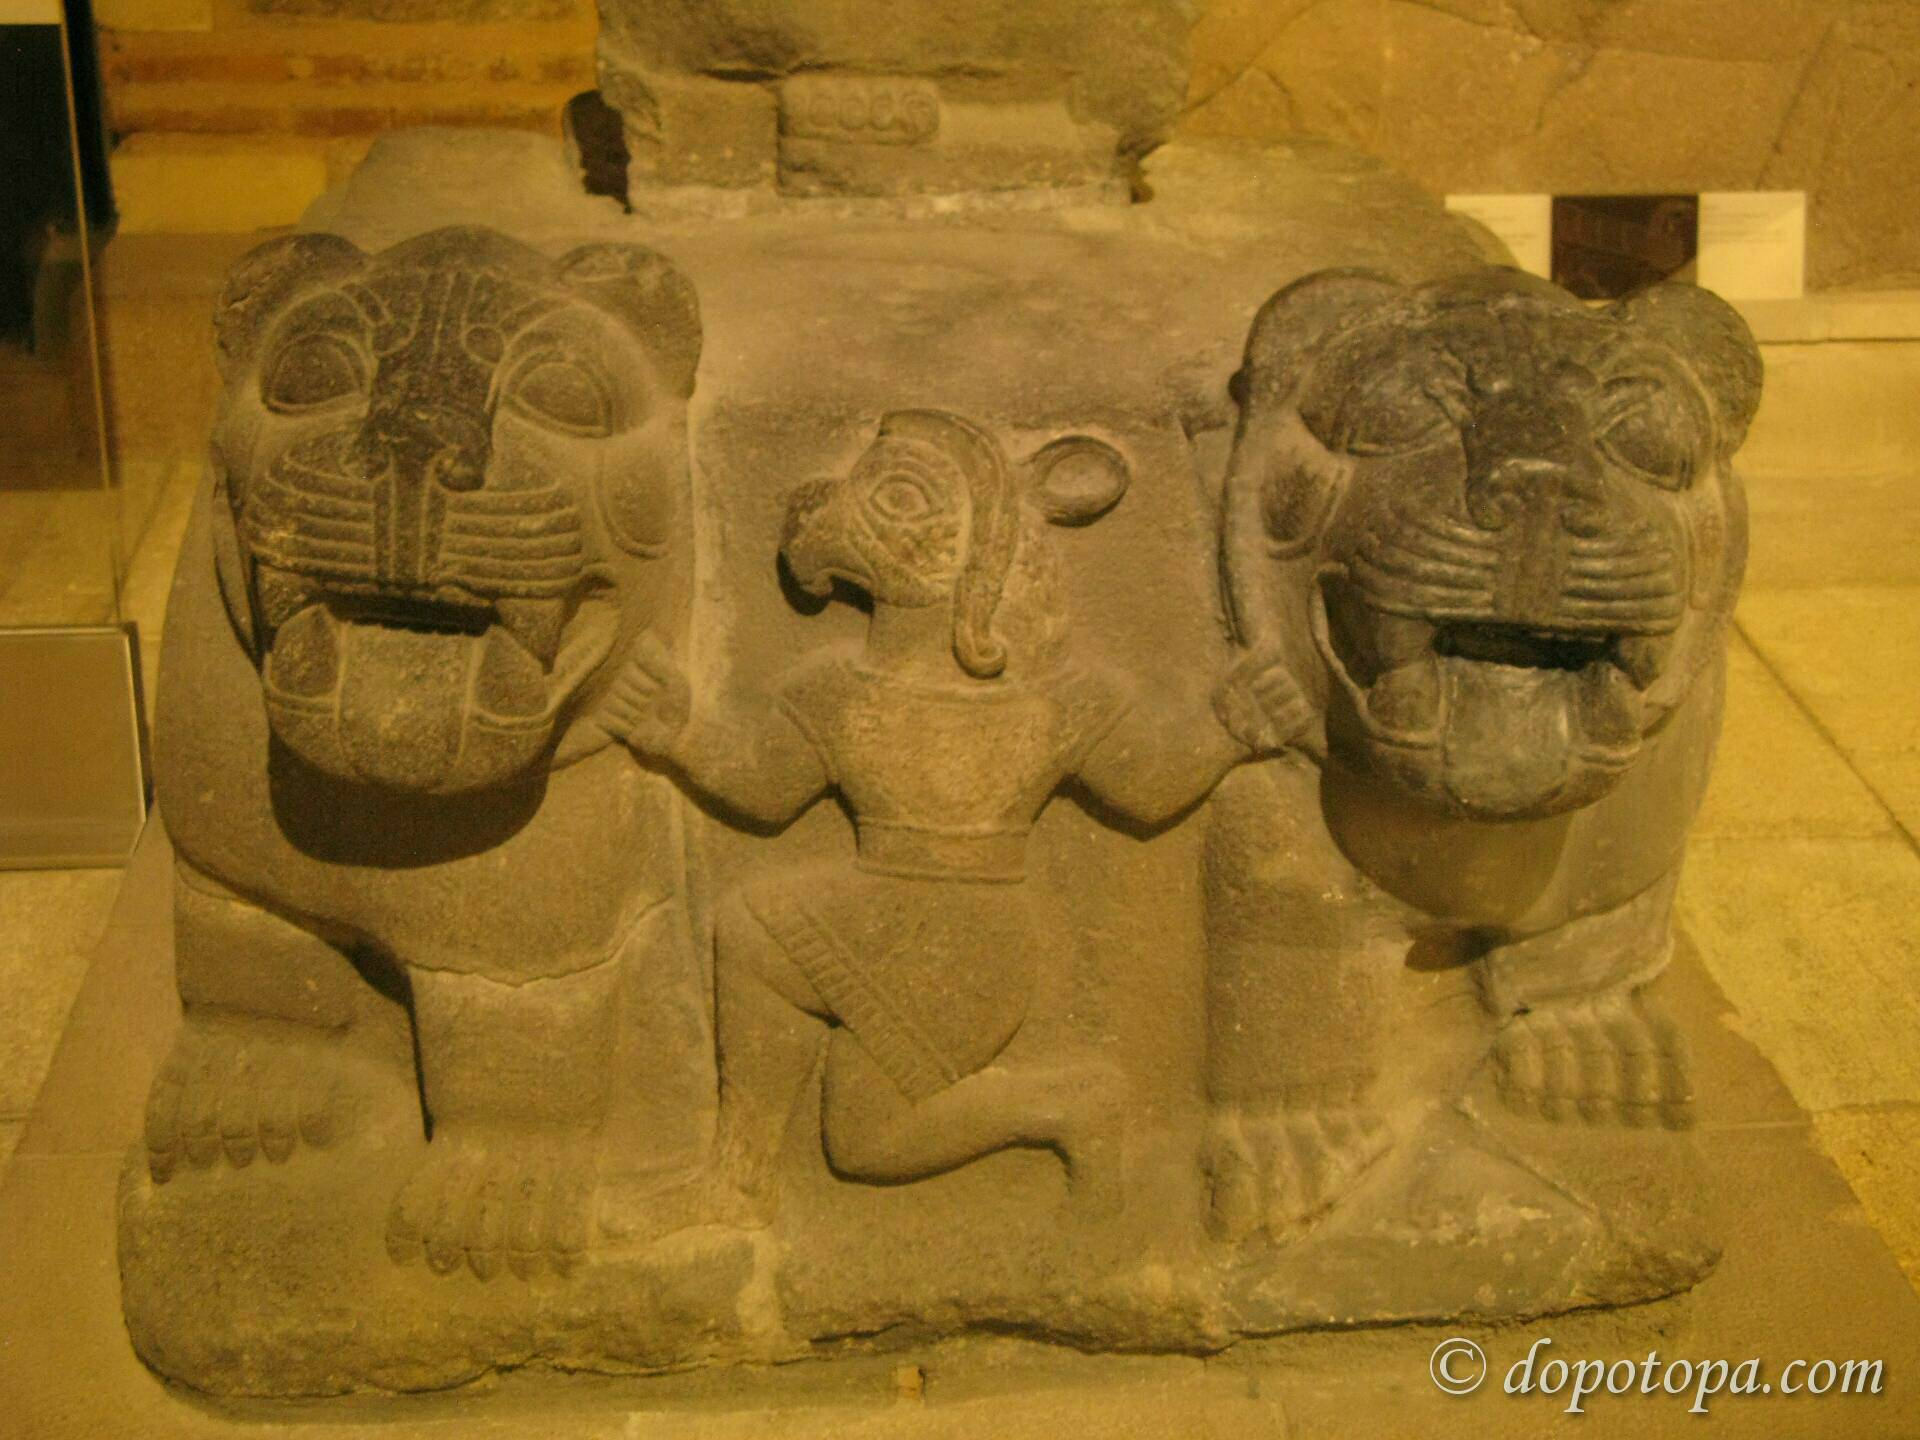 ankara_museum_stone_artefacts_49.JPG